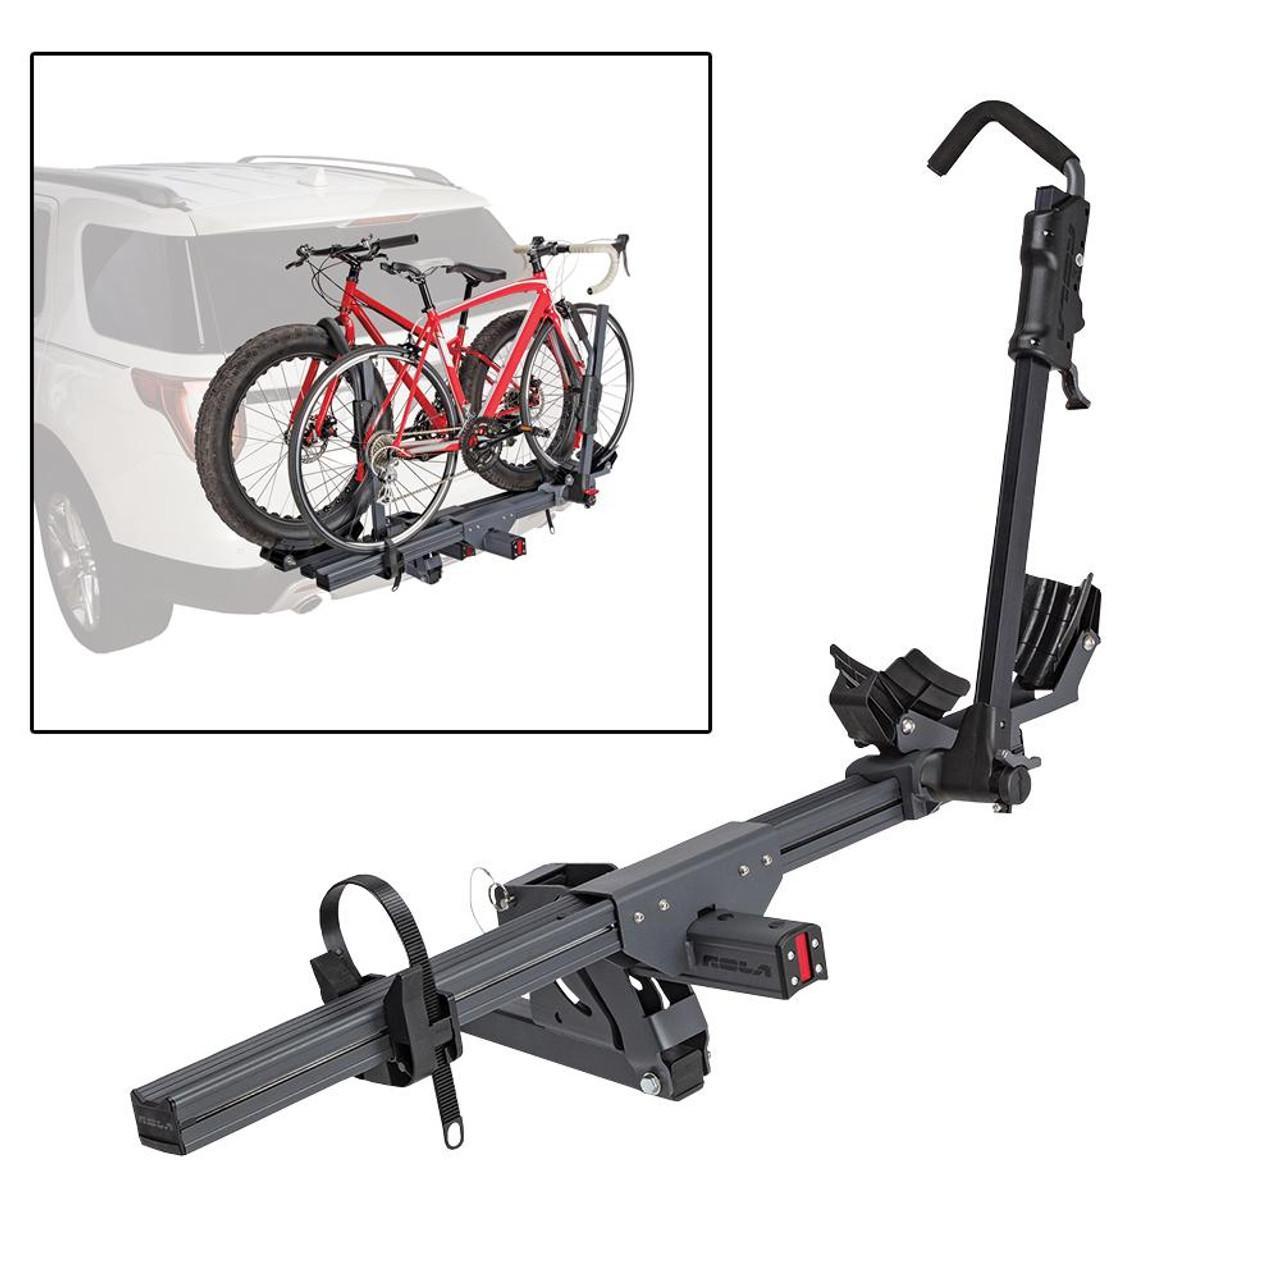 TX w//Tilt /& Security ROLA Bike Carrier Hitch Mount 4-Bike